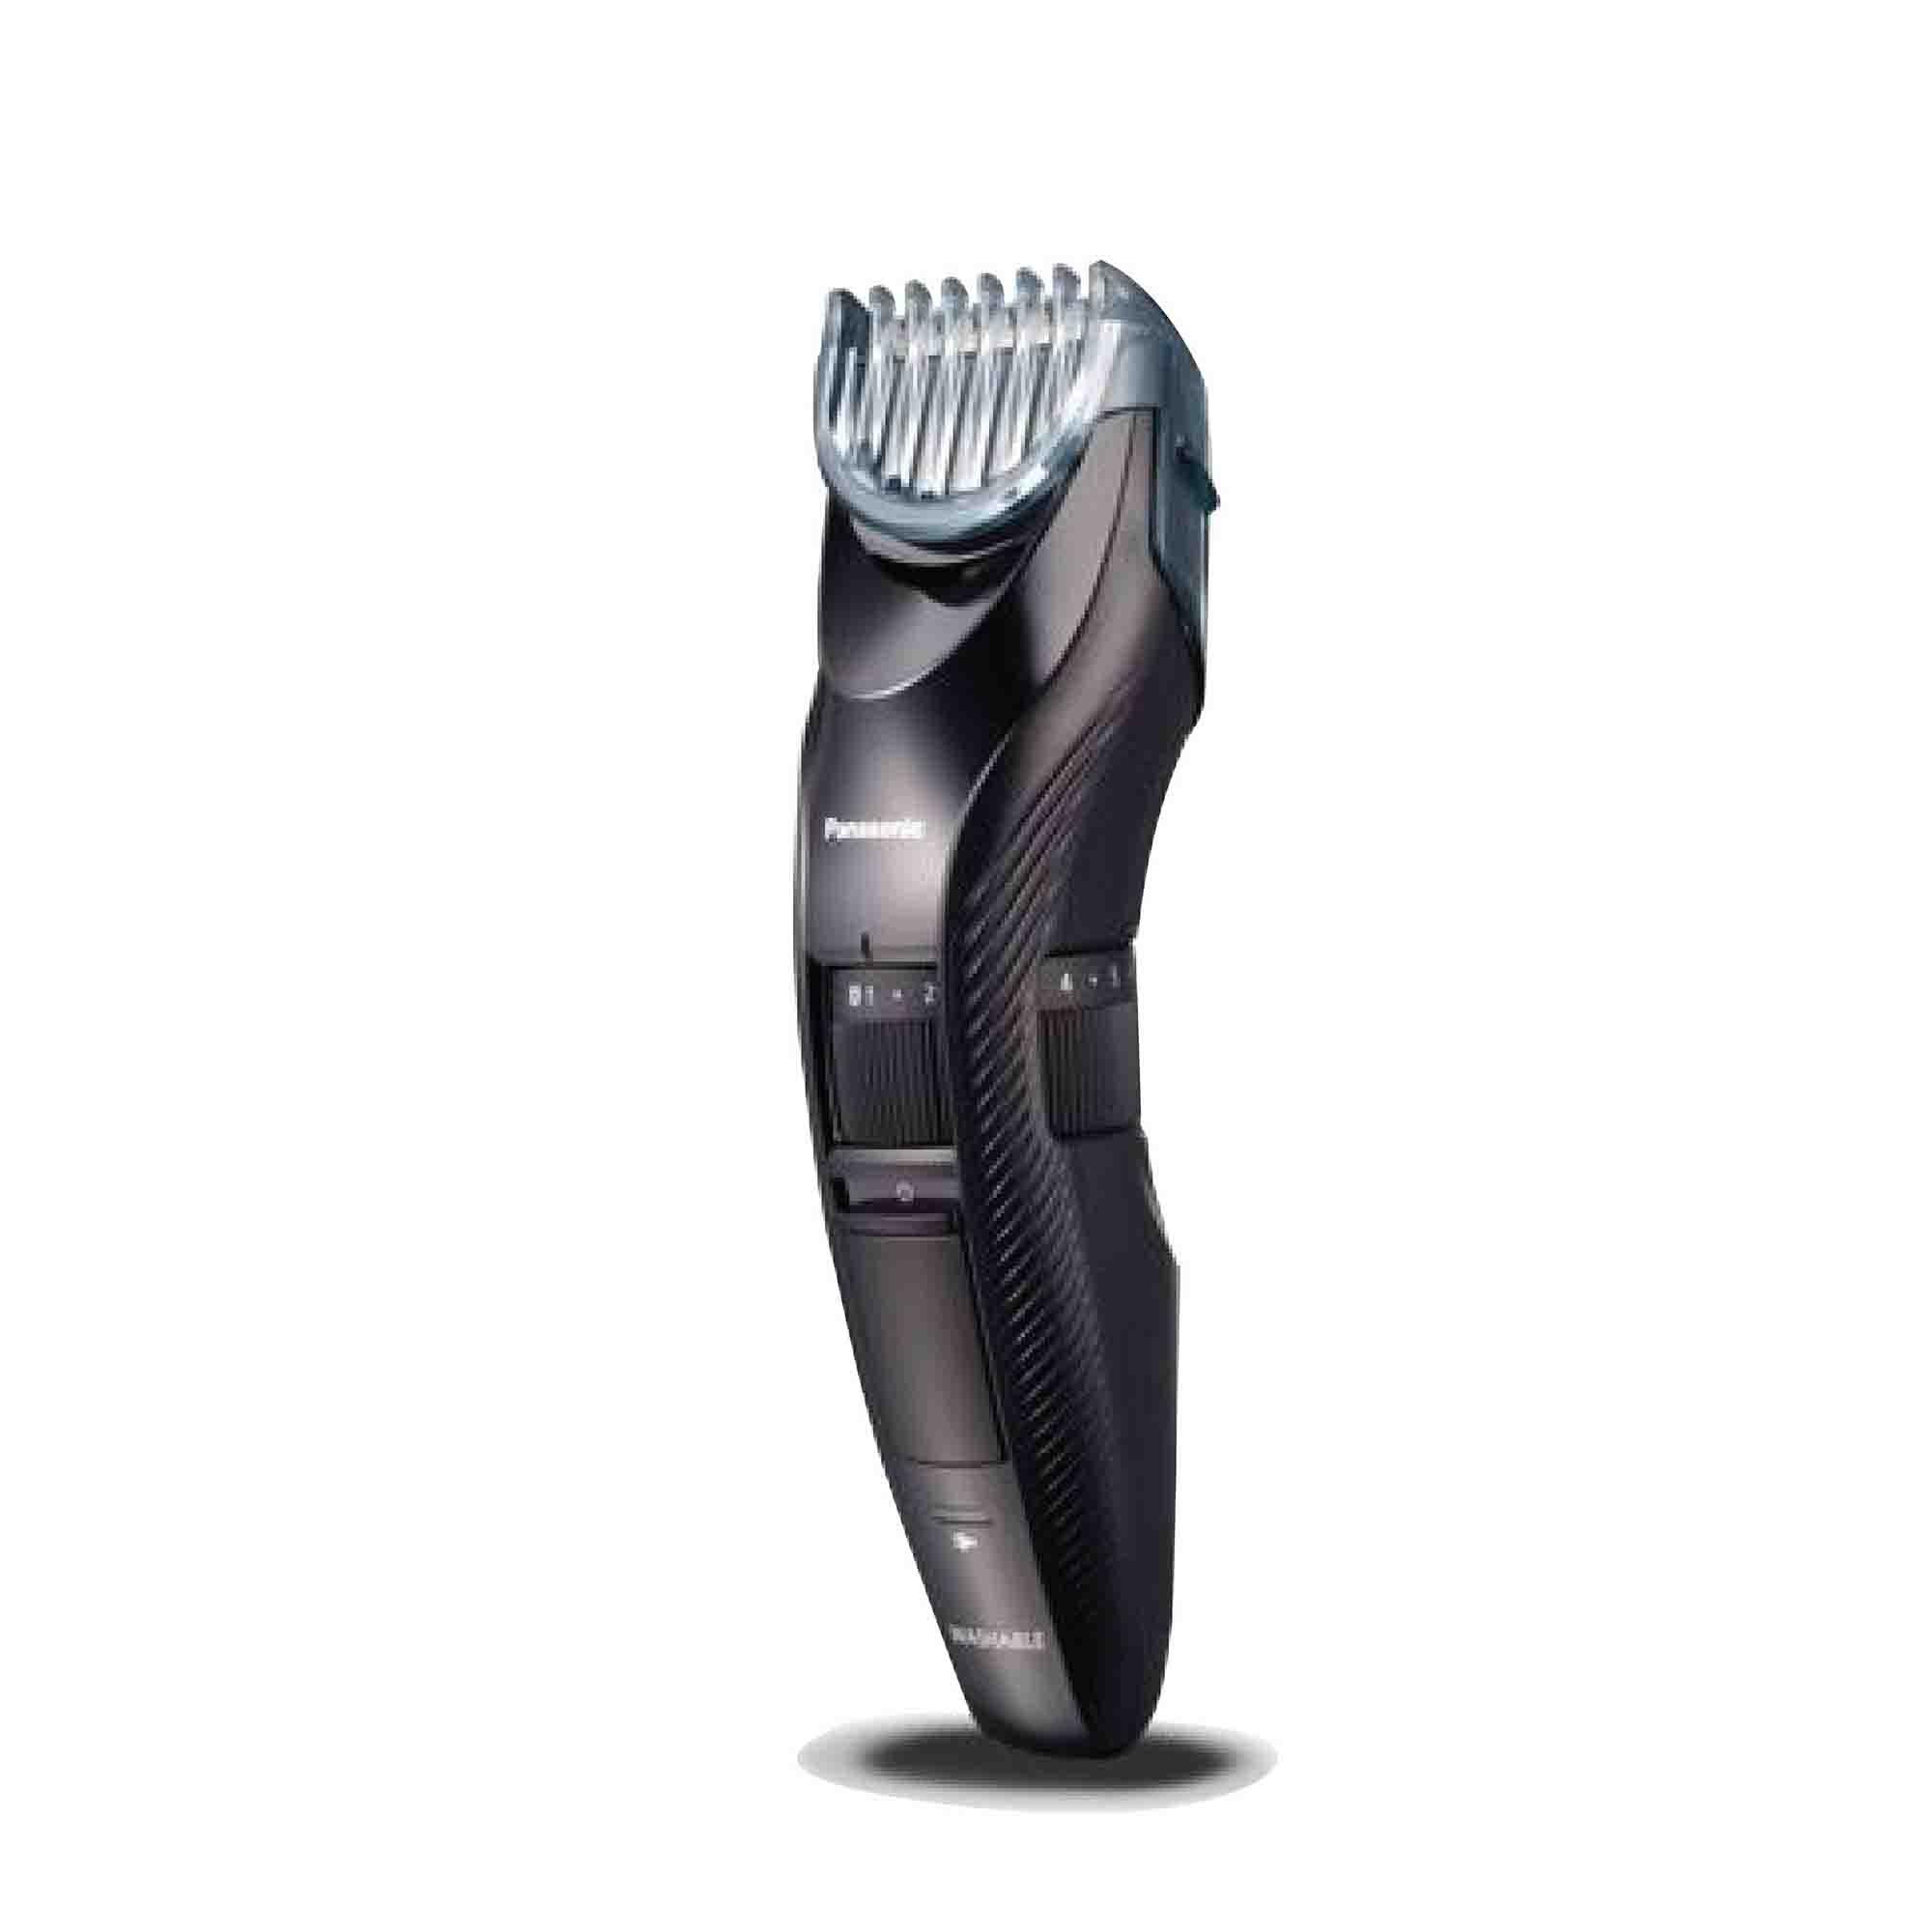 Panasonic Beard & Hair Trimmer ER-GC5 (end 5/2/2020 8:21 PM)